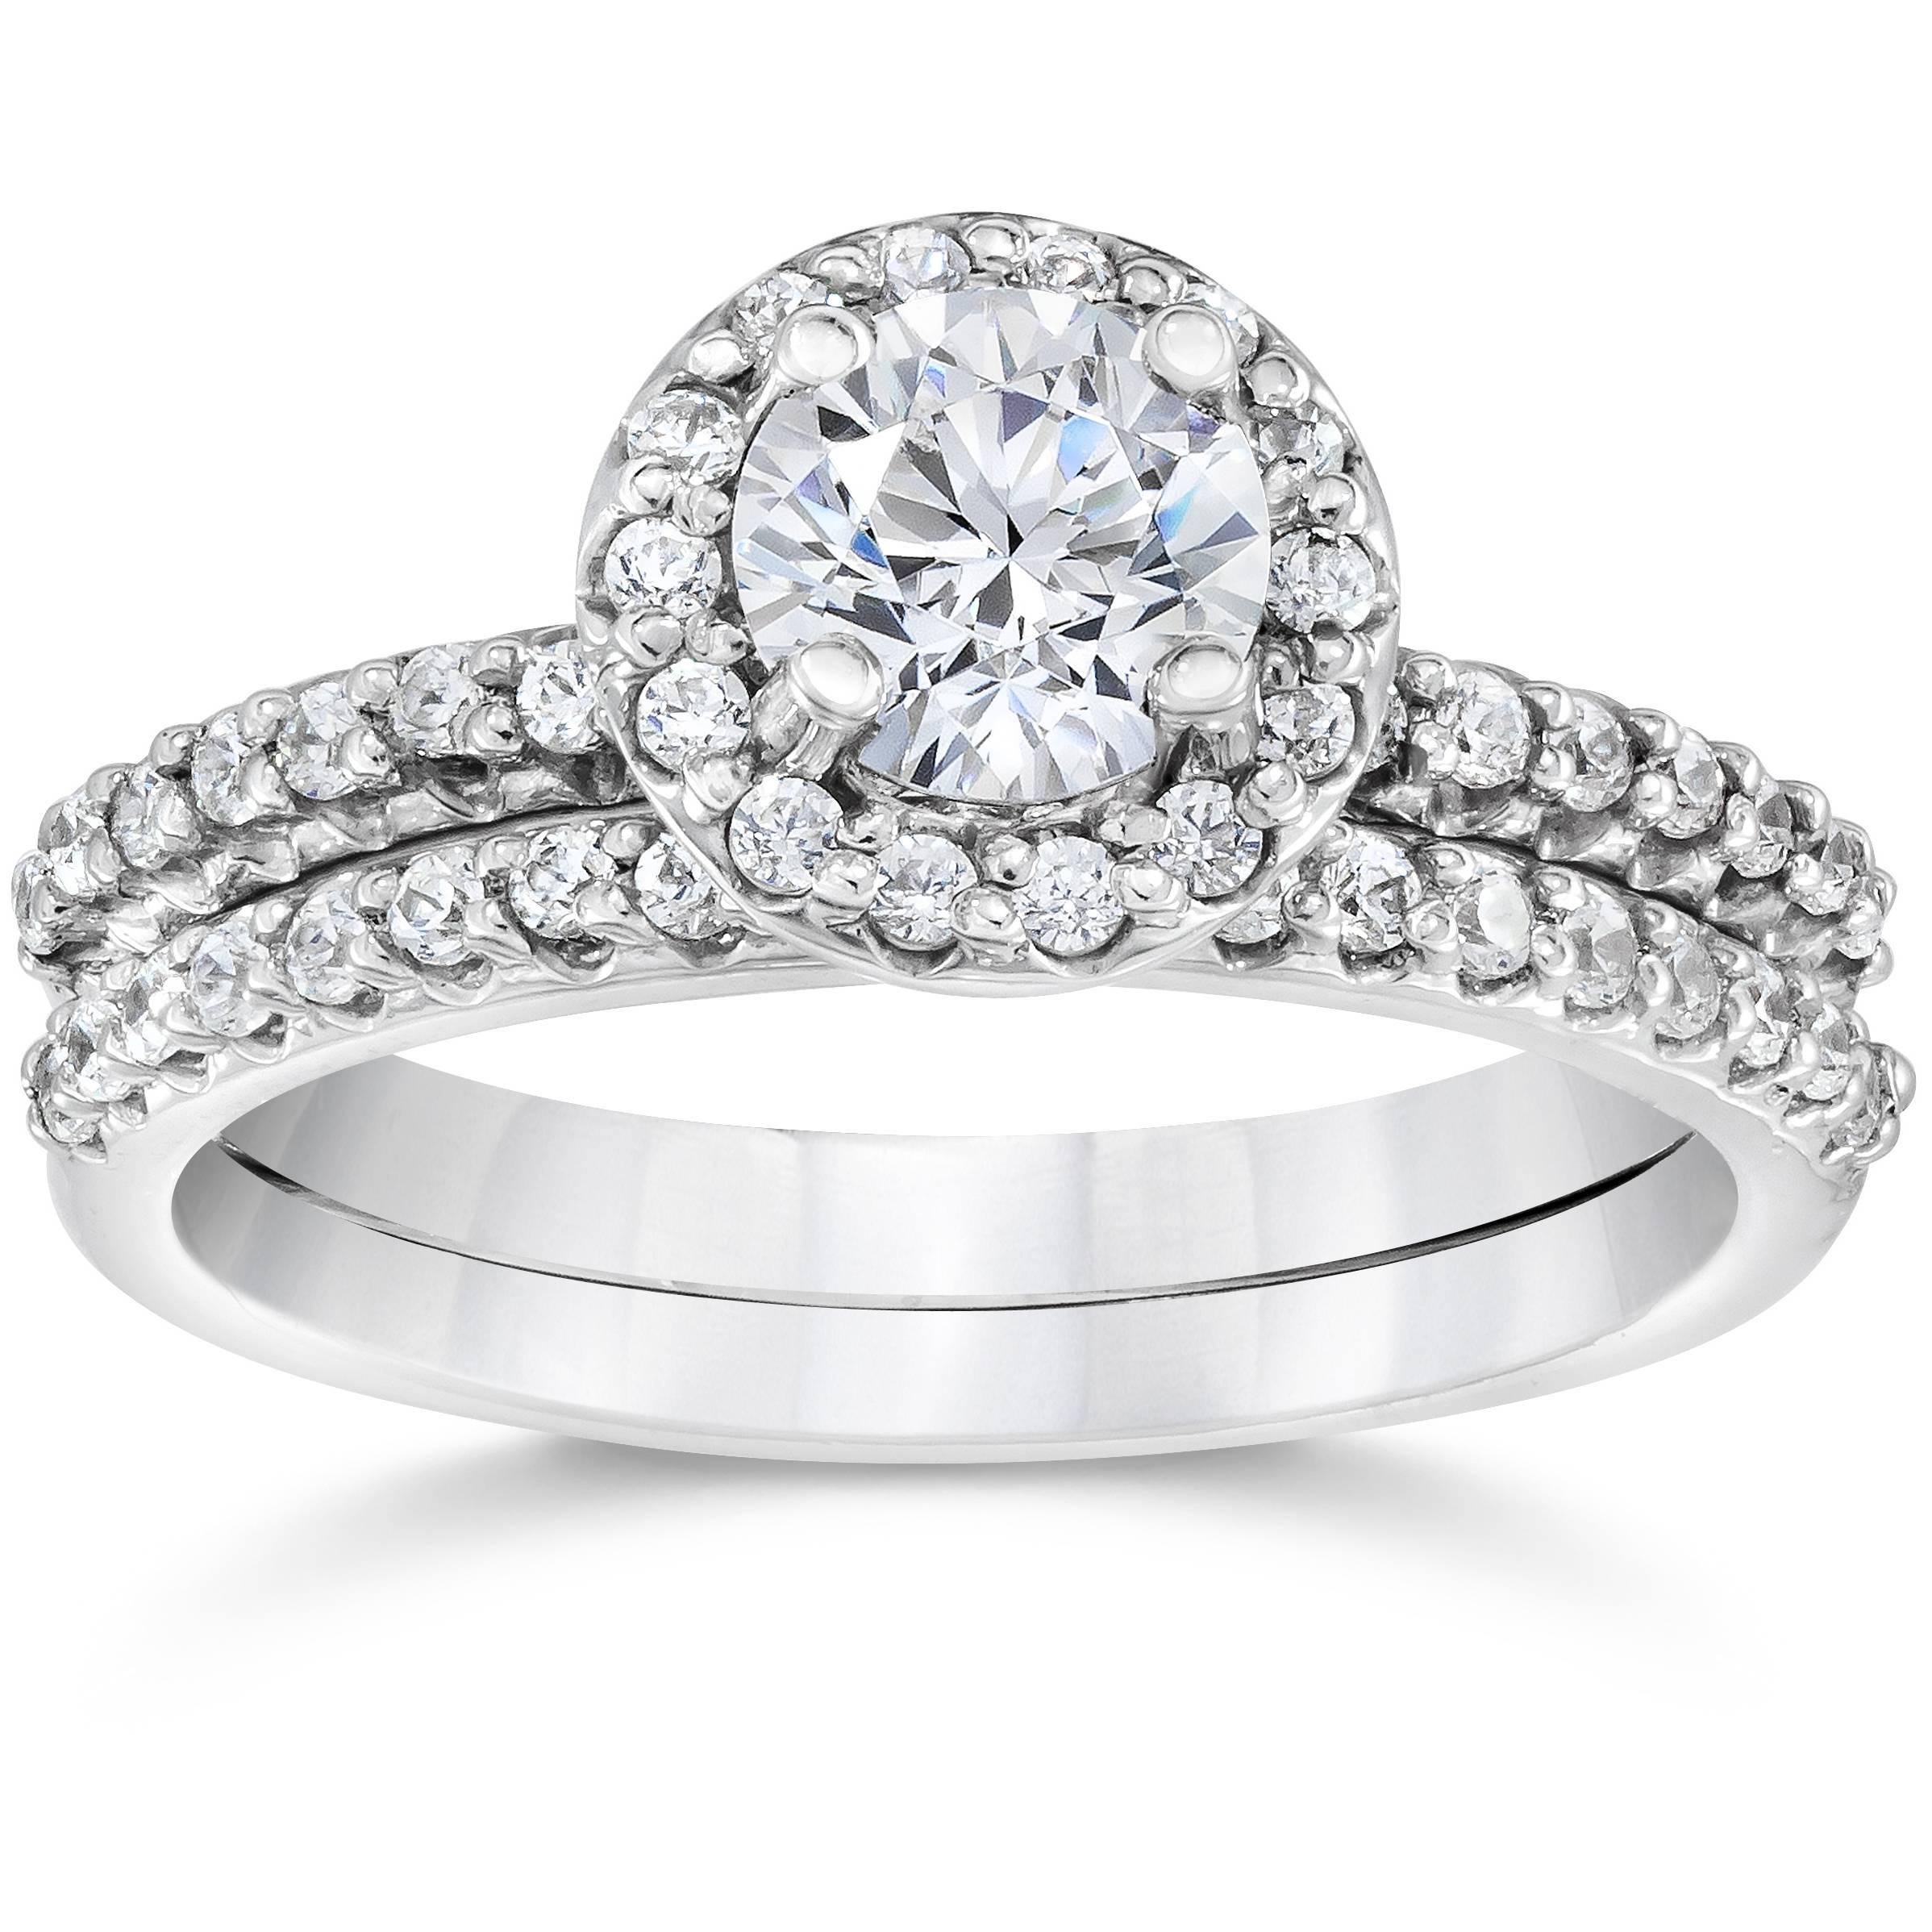 1 1 10ct diamond pave halo solitaire engagement wedding. Black Bedroom Furniture Sets. Home Design Ideas